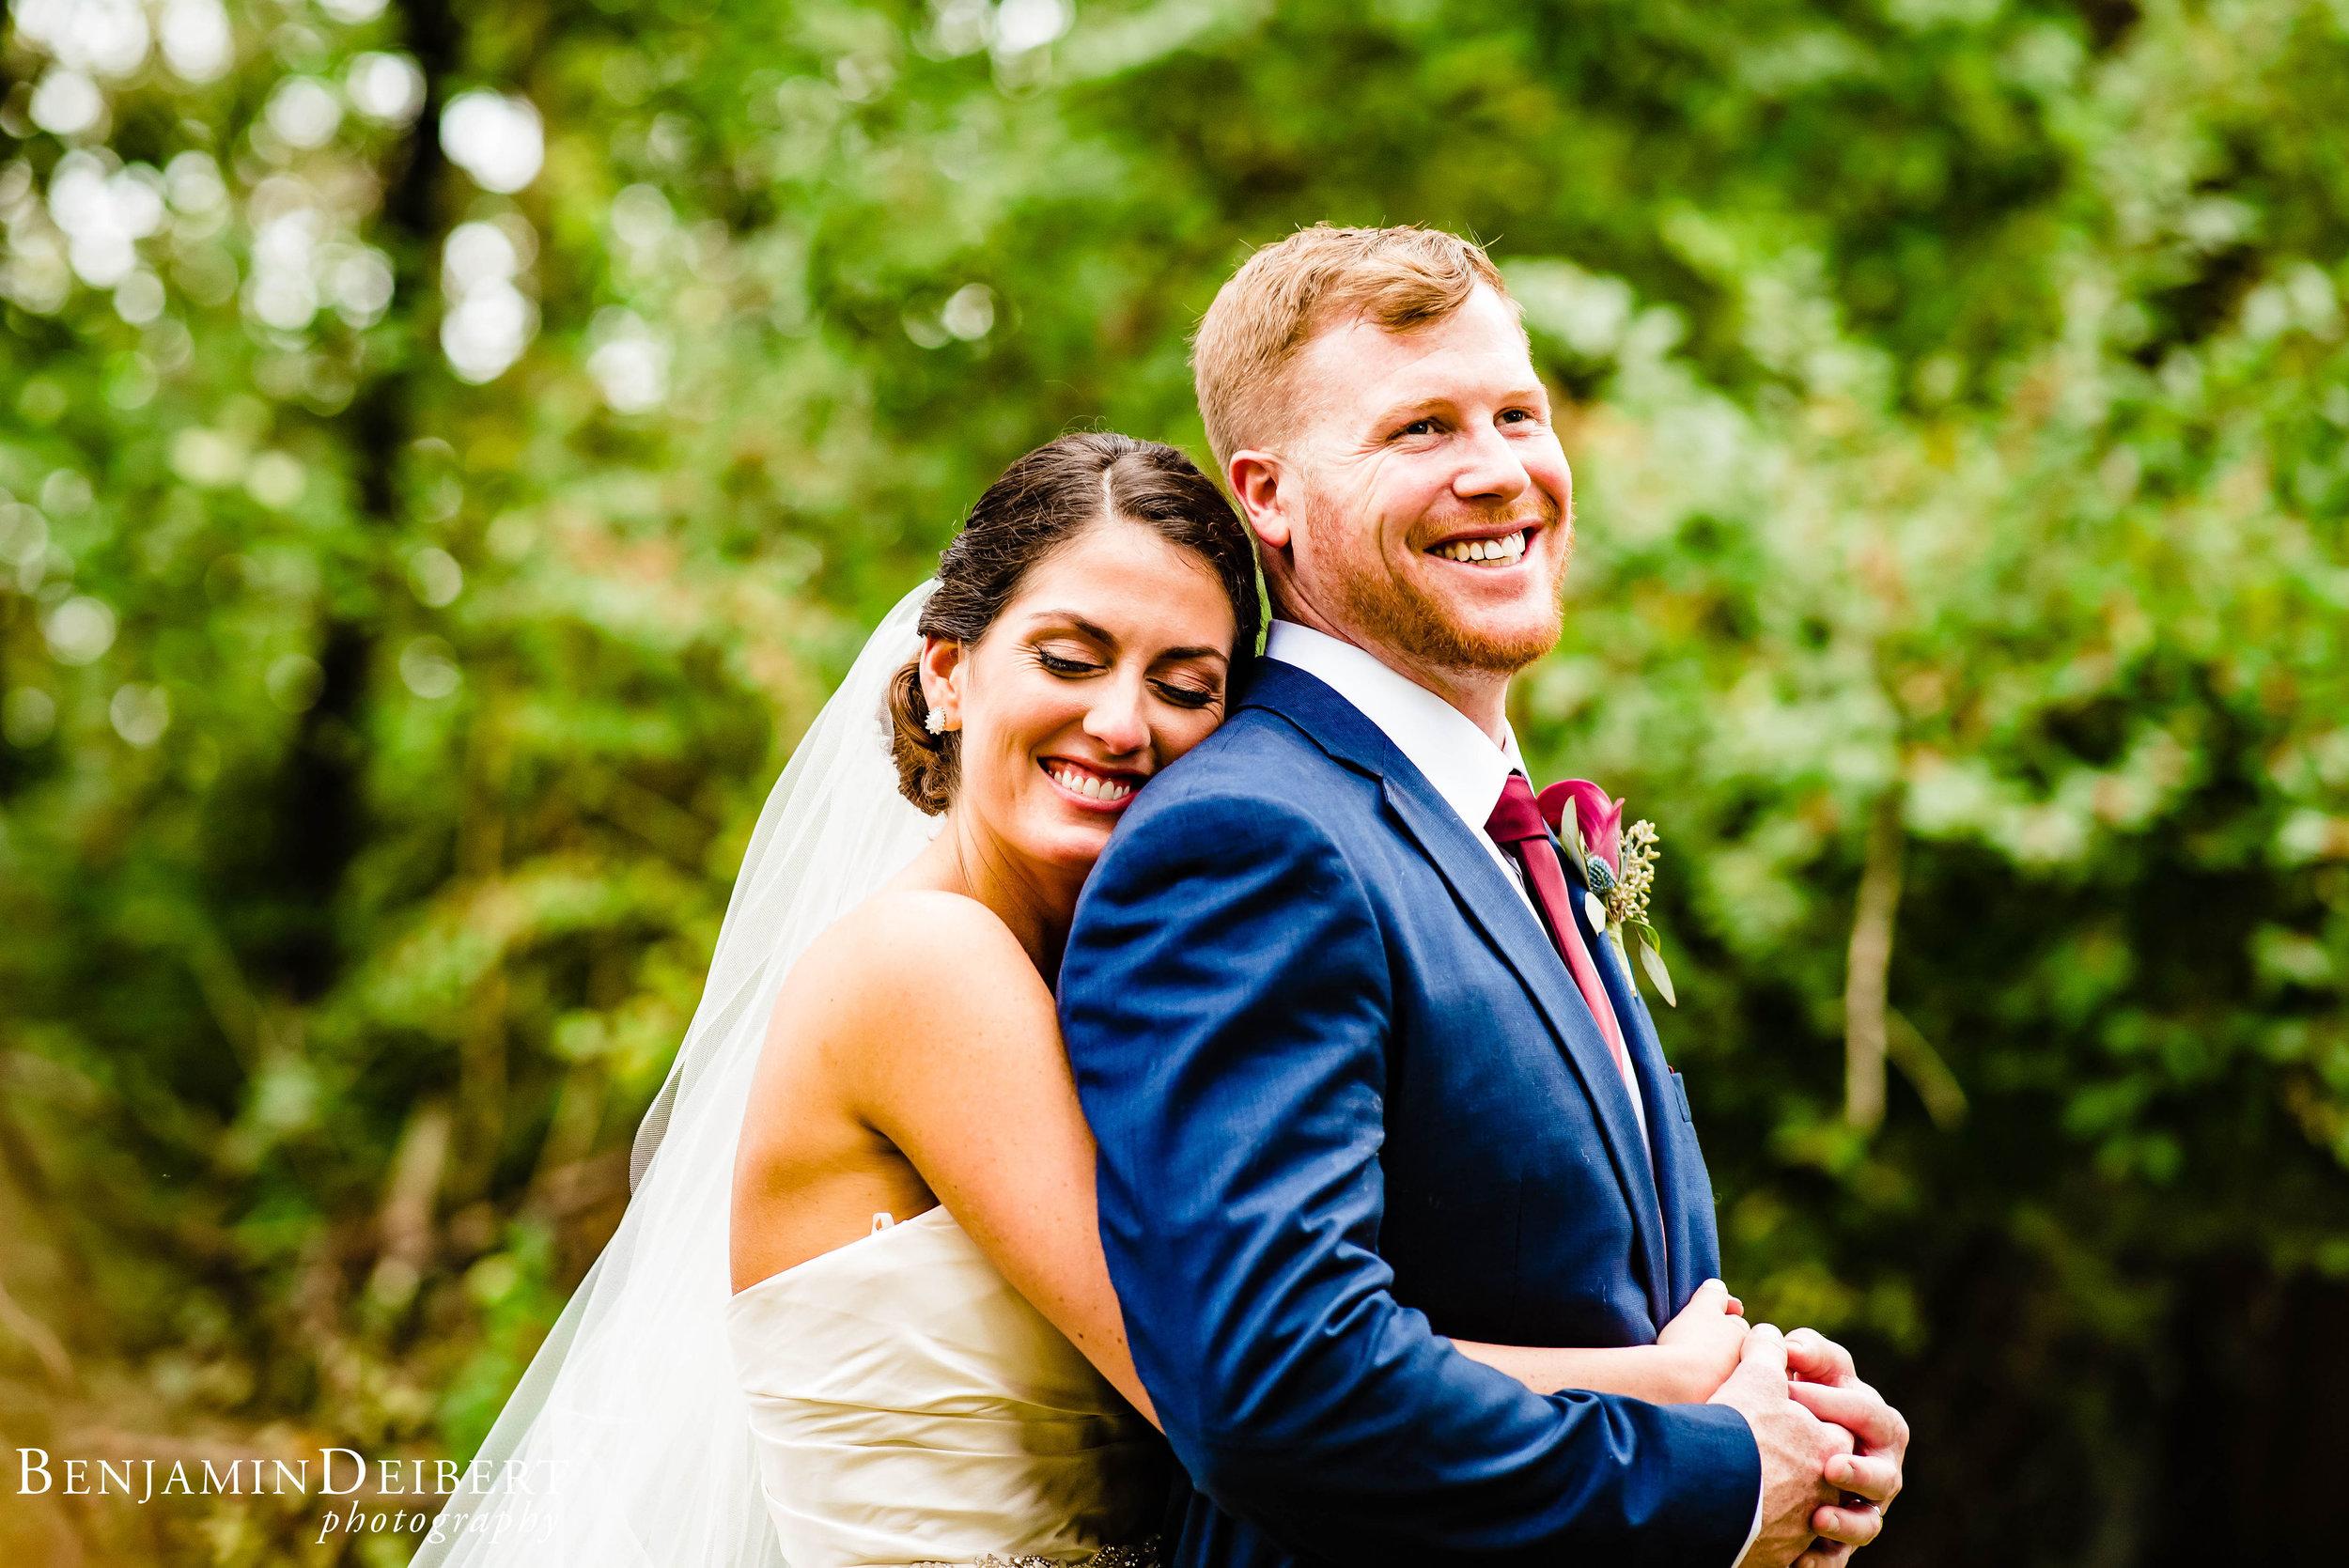 TeghanandChris_BridgemensBallroom_Wedding-73.jpg